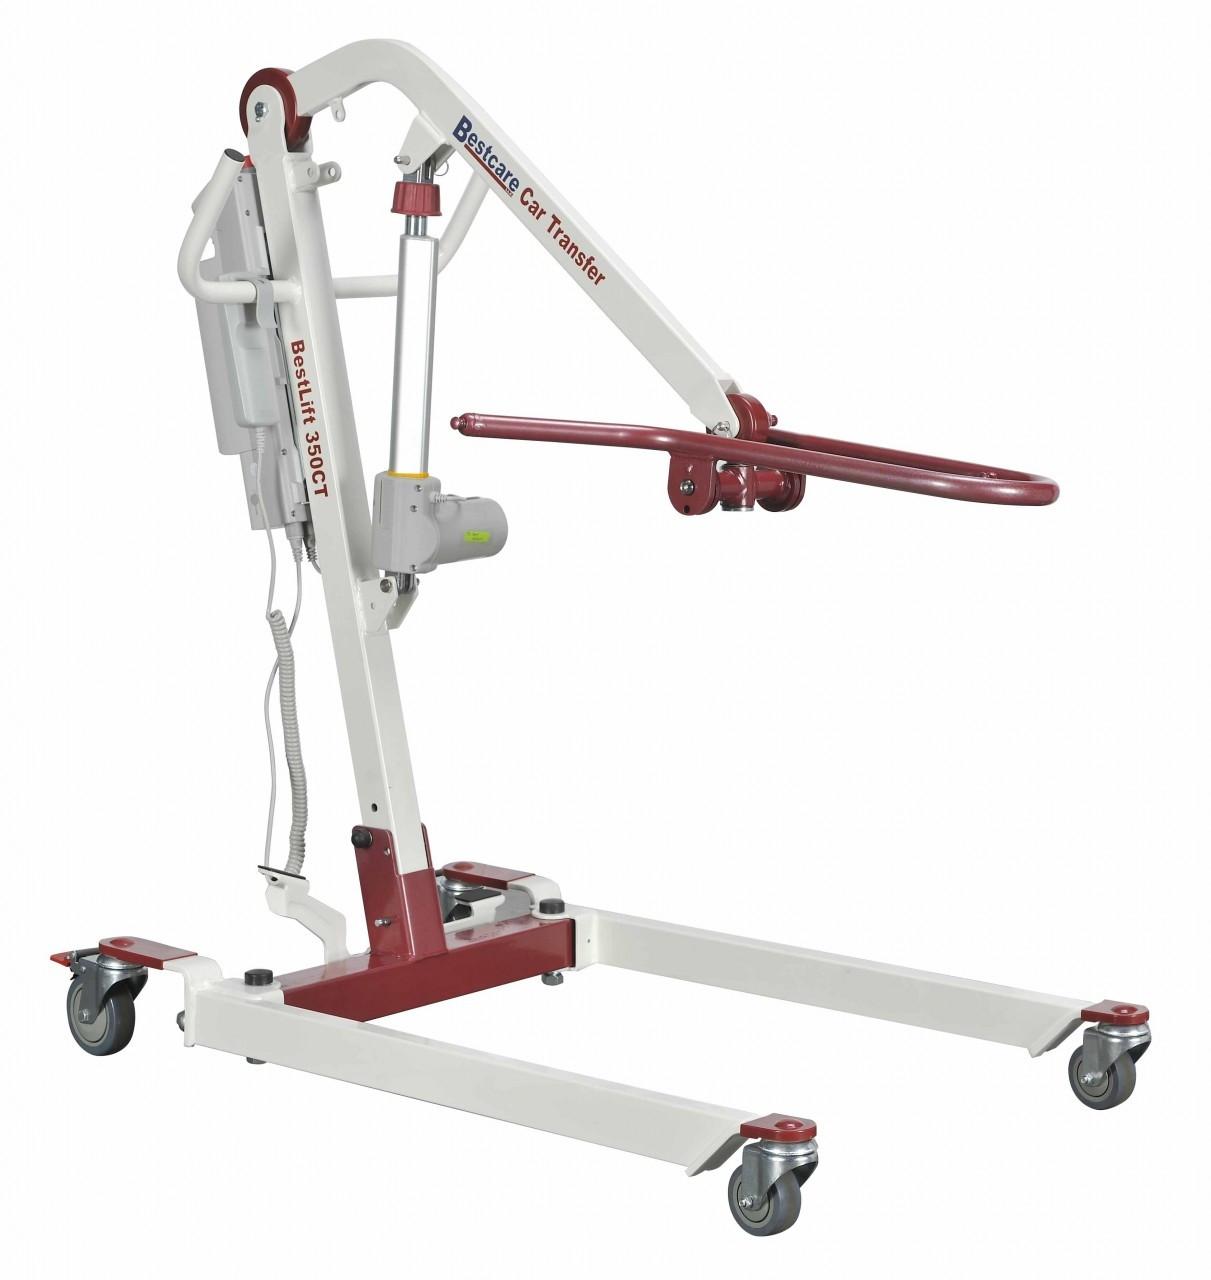 BestLift Full Body Patient Lift for Car Transfer PL350CT